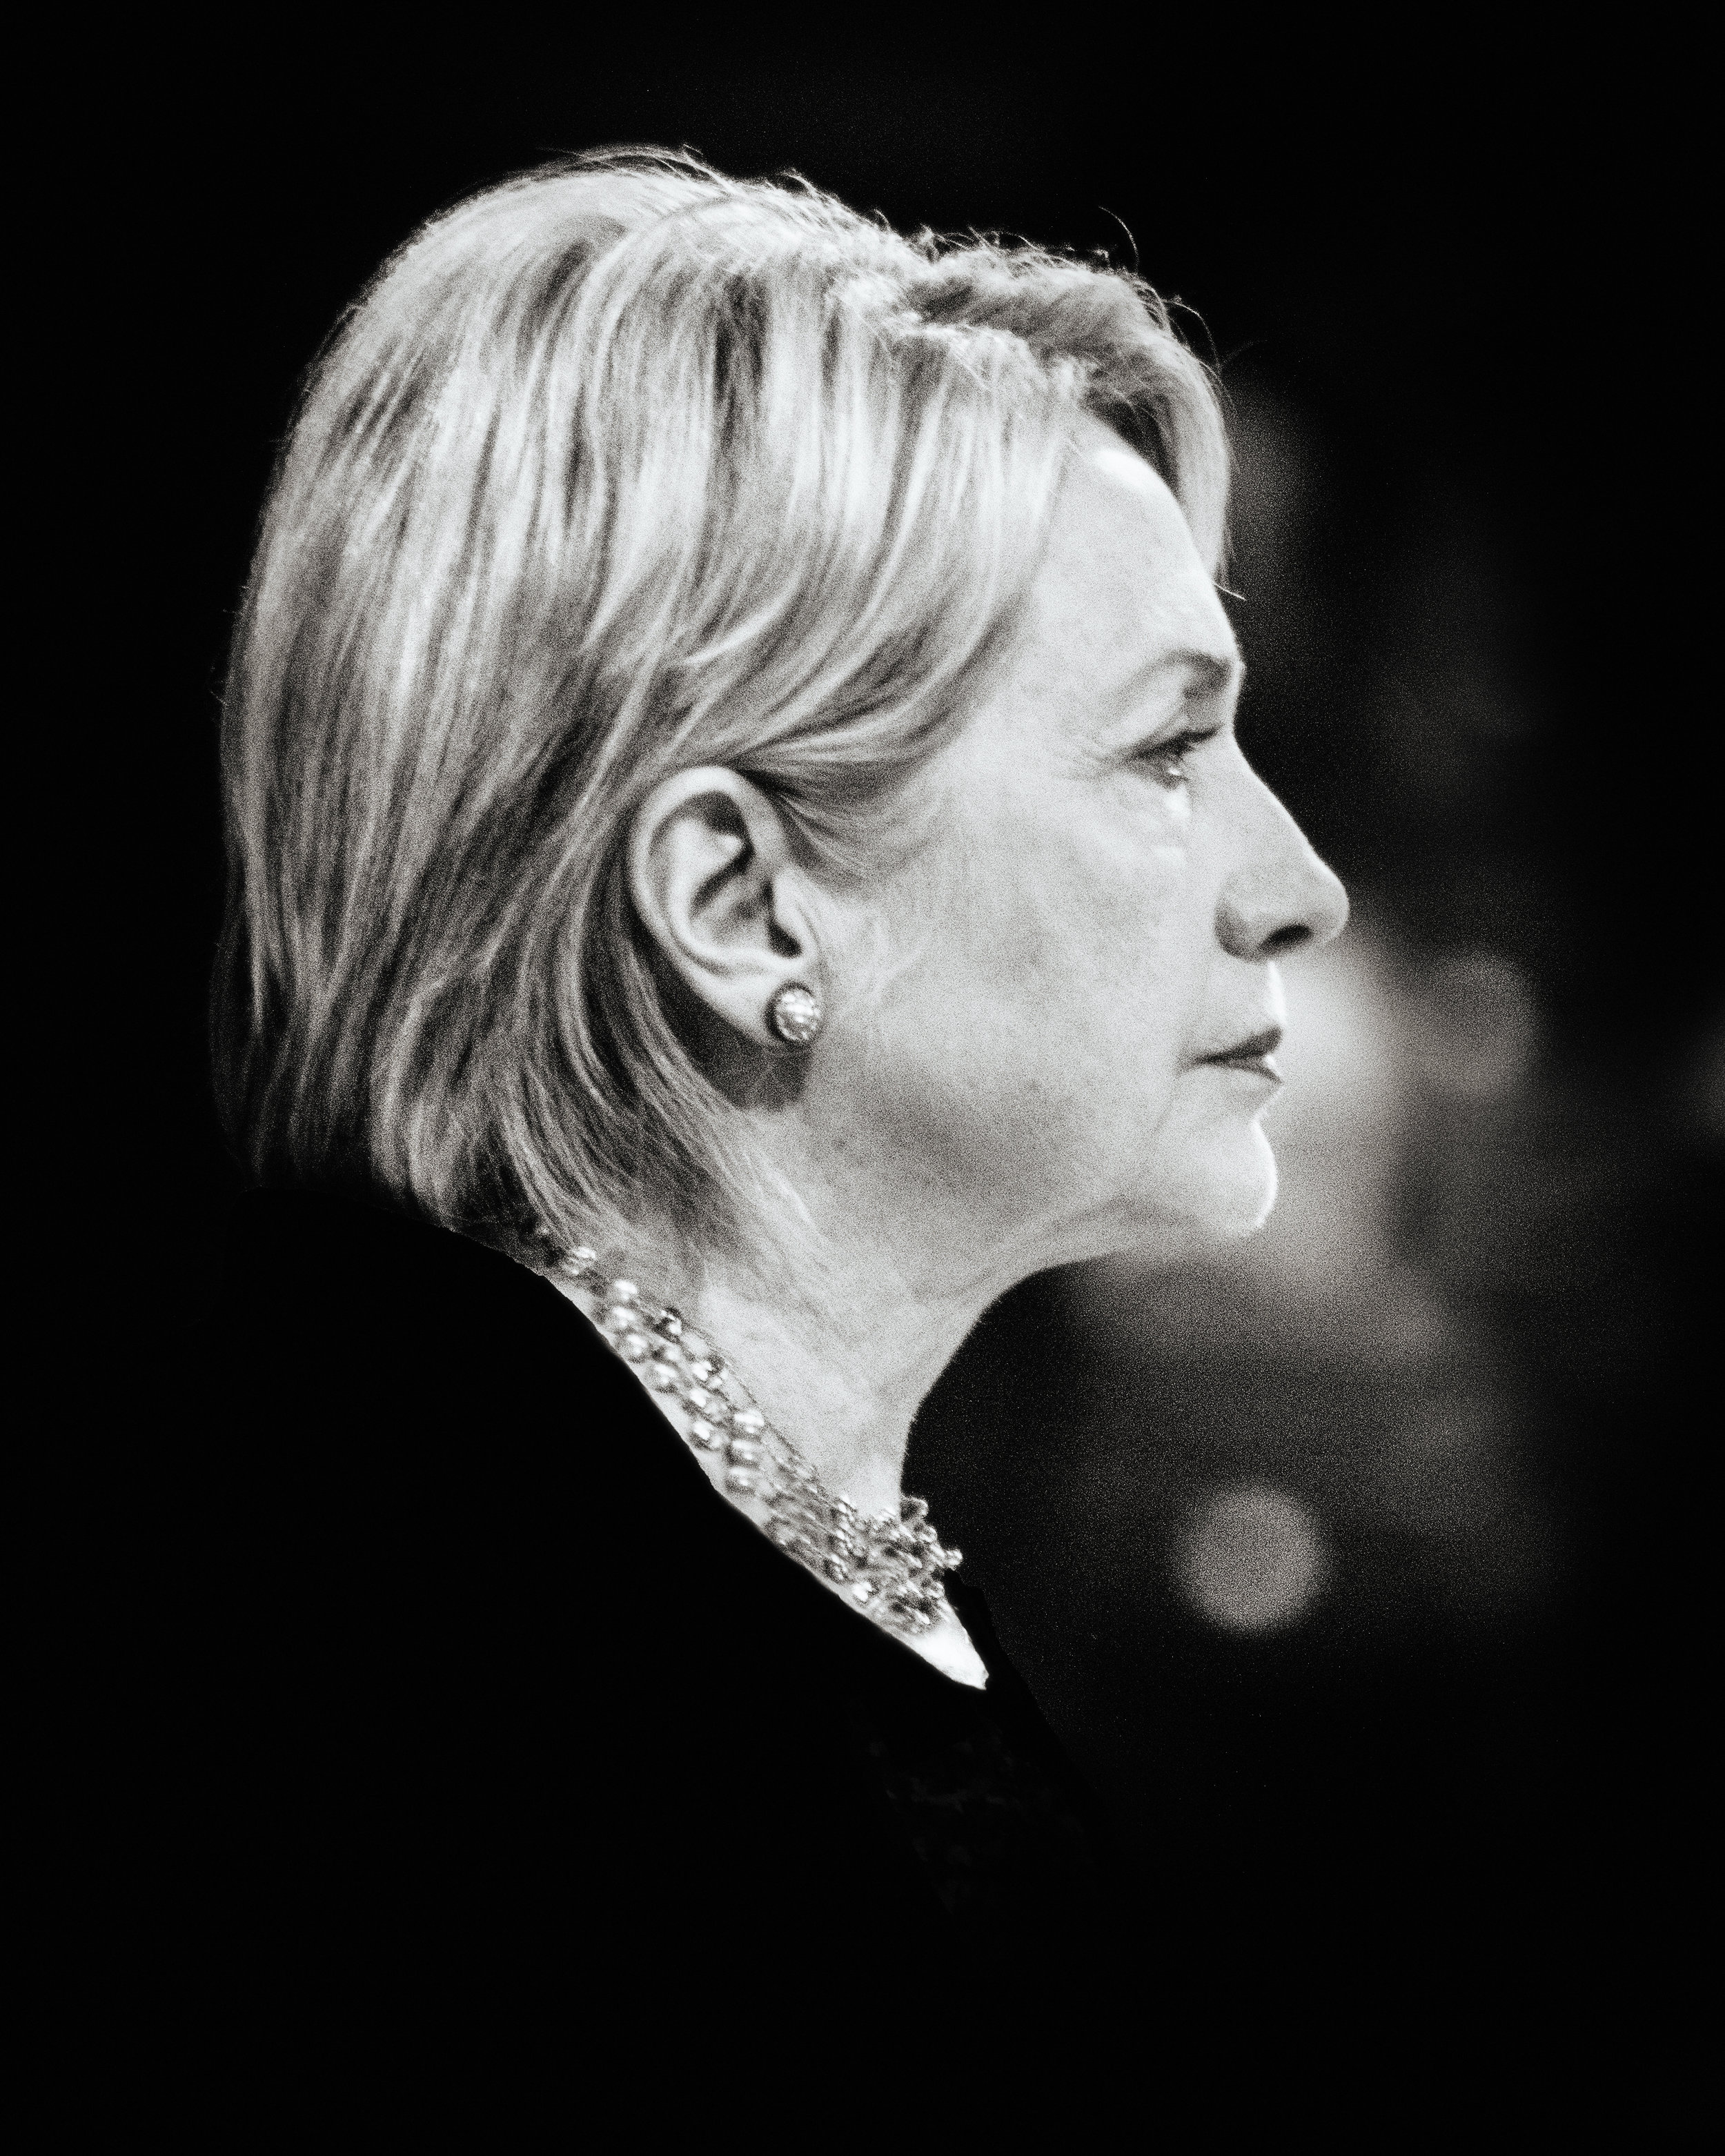 Hillary Clinton Portrait 5